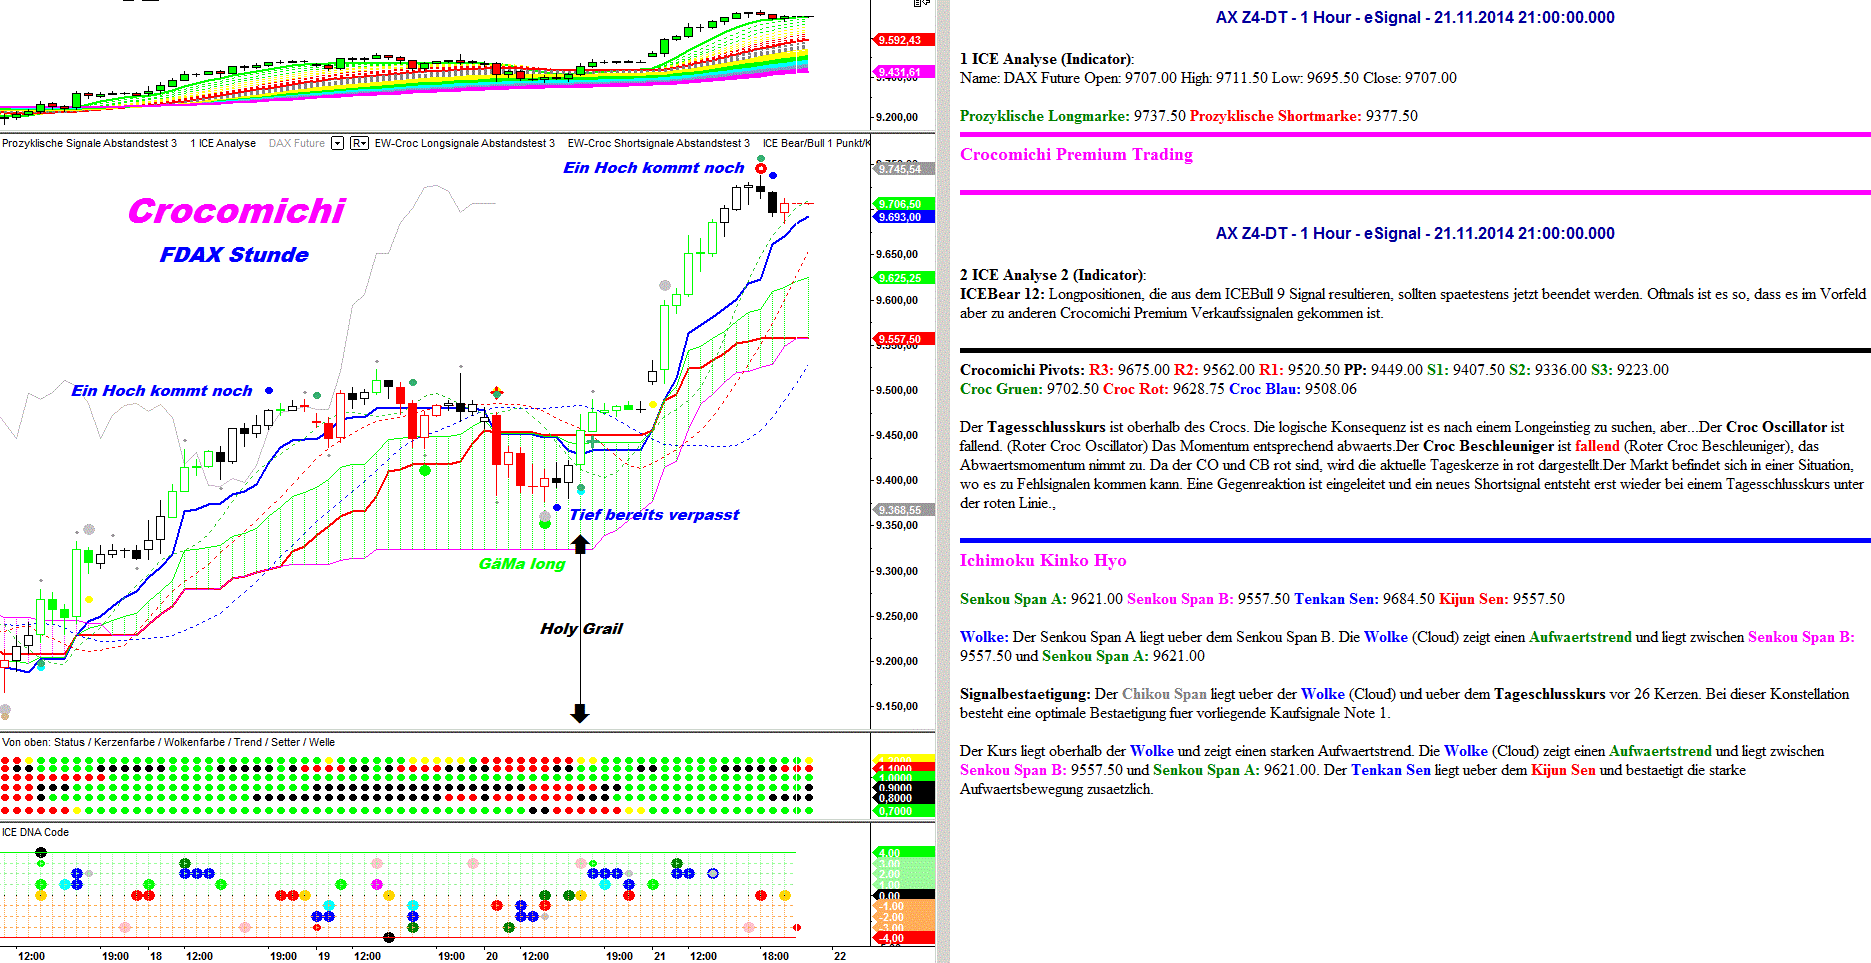 EW-Analyse-DOW-Jones-5-0-Depotzuwachs-an-einem-Tag-Kommentar-André-Tiedje-GodmodeTrader.de-6